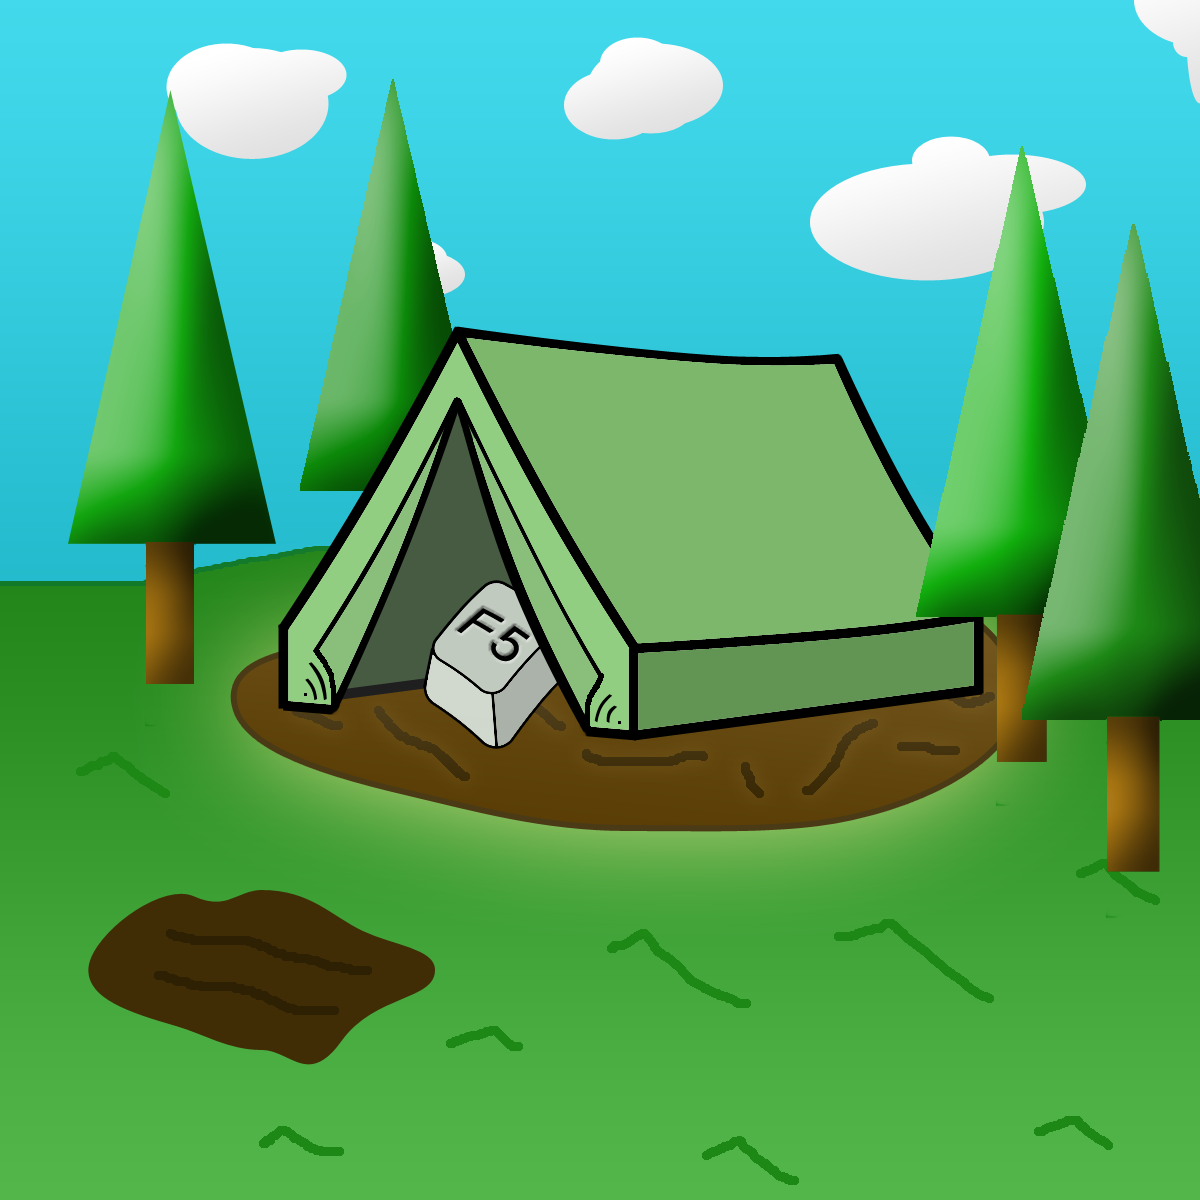 F5 Camping